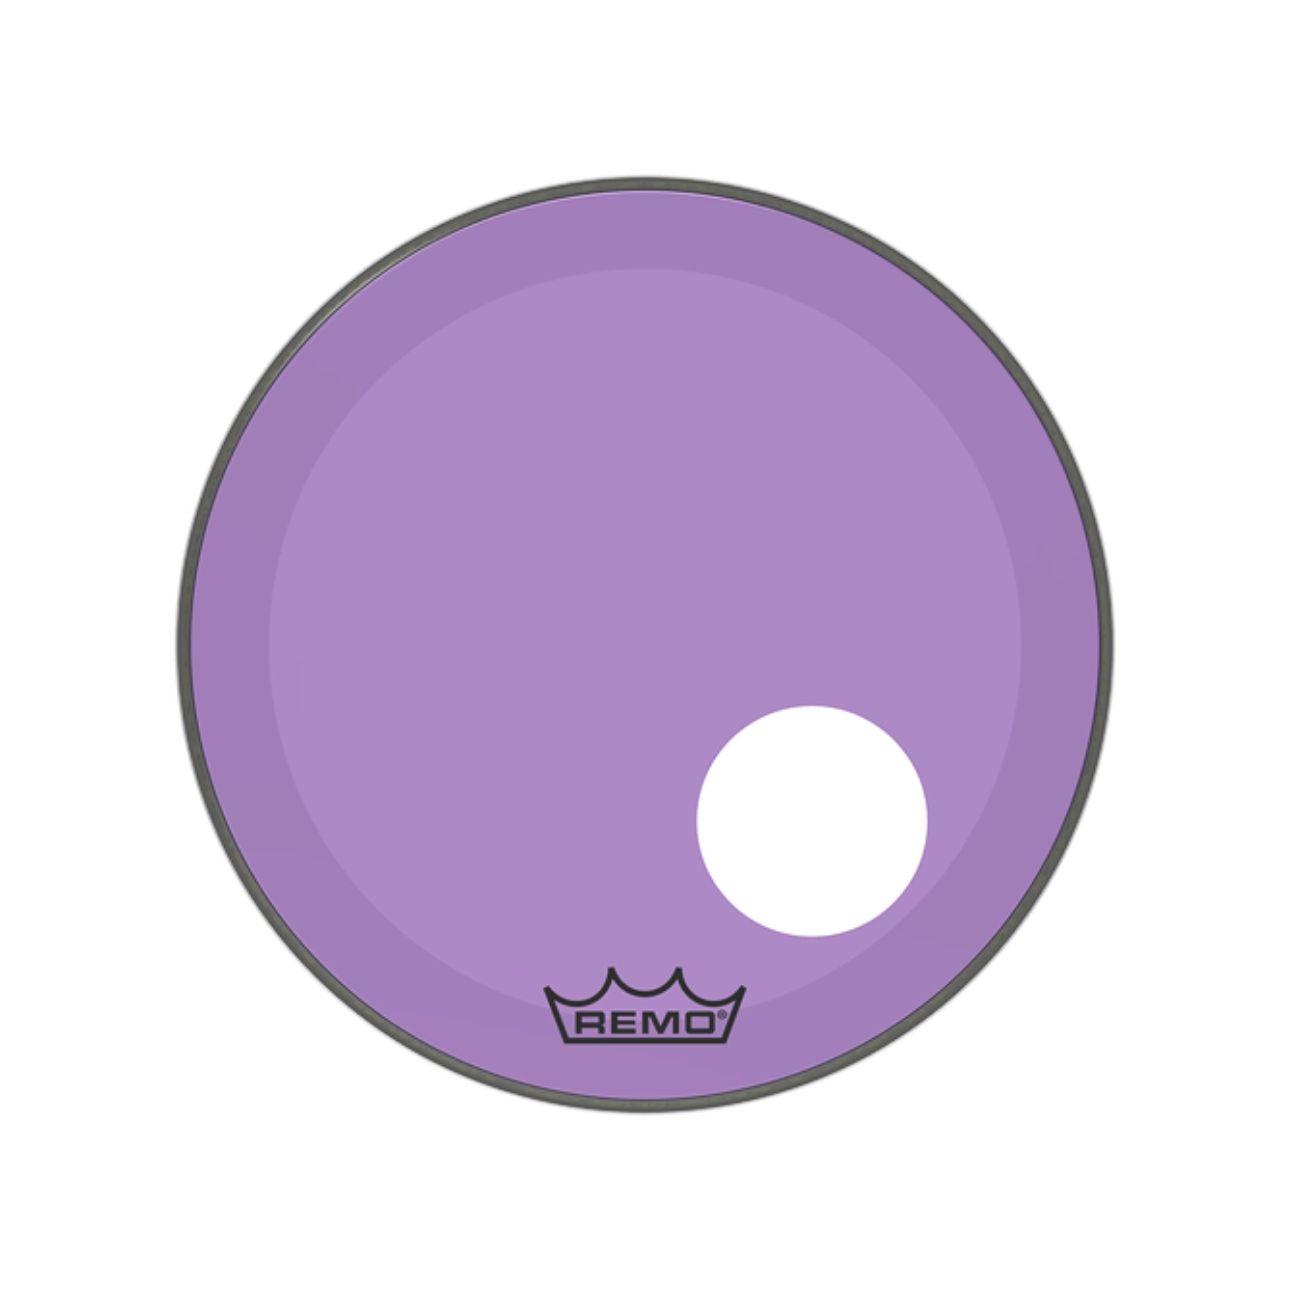 "Pele Bumbo 20"" Powerstroke 3 Com Furo Roxa P3-1320-CT-PUOH"